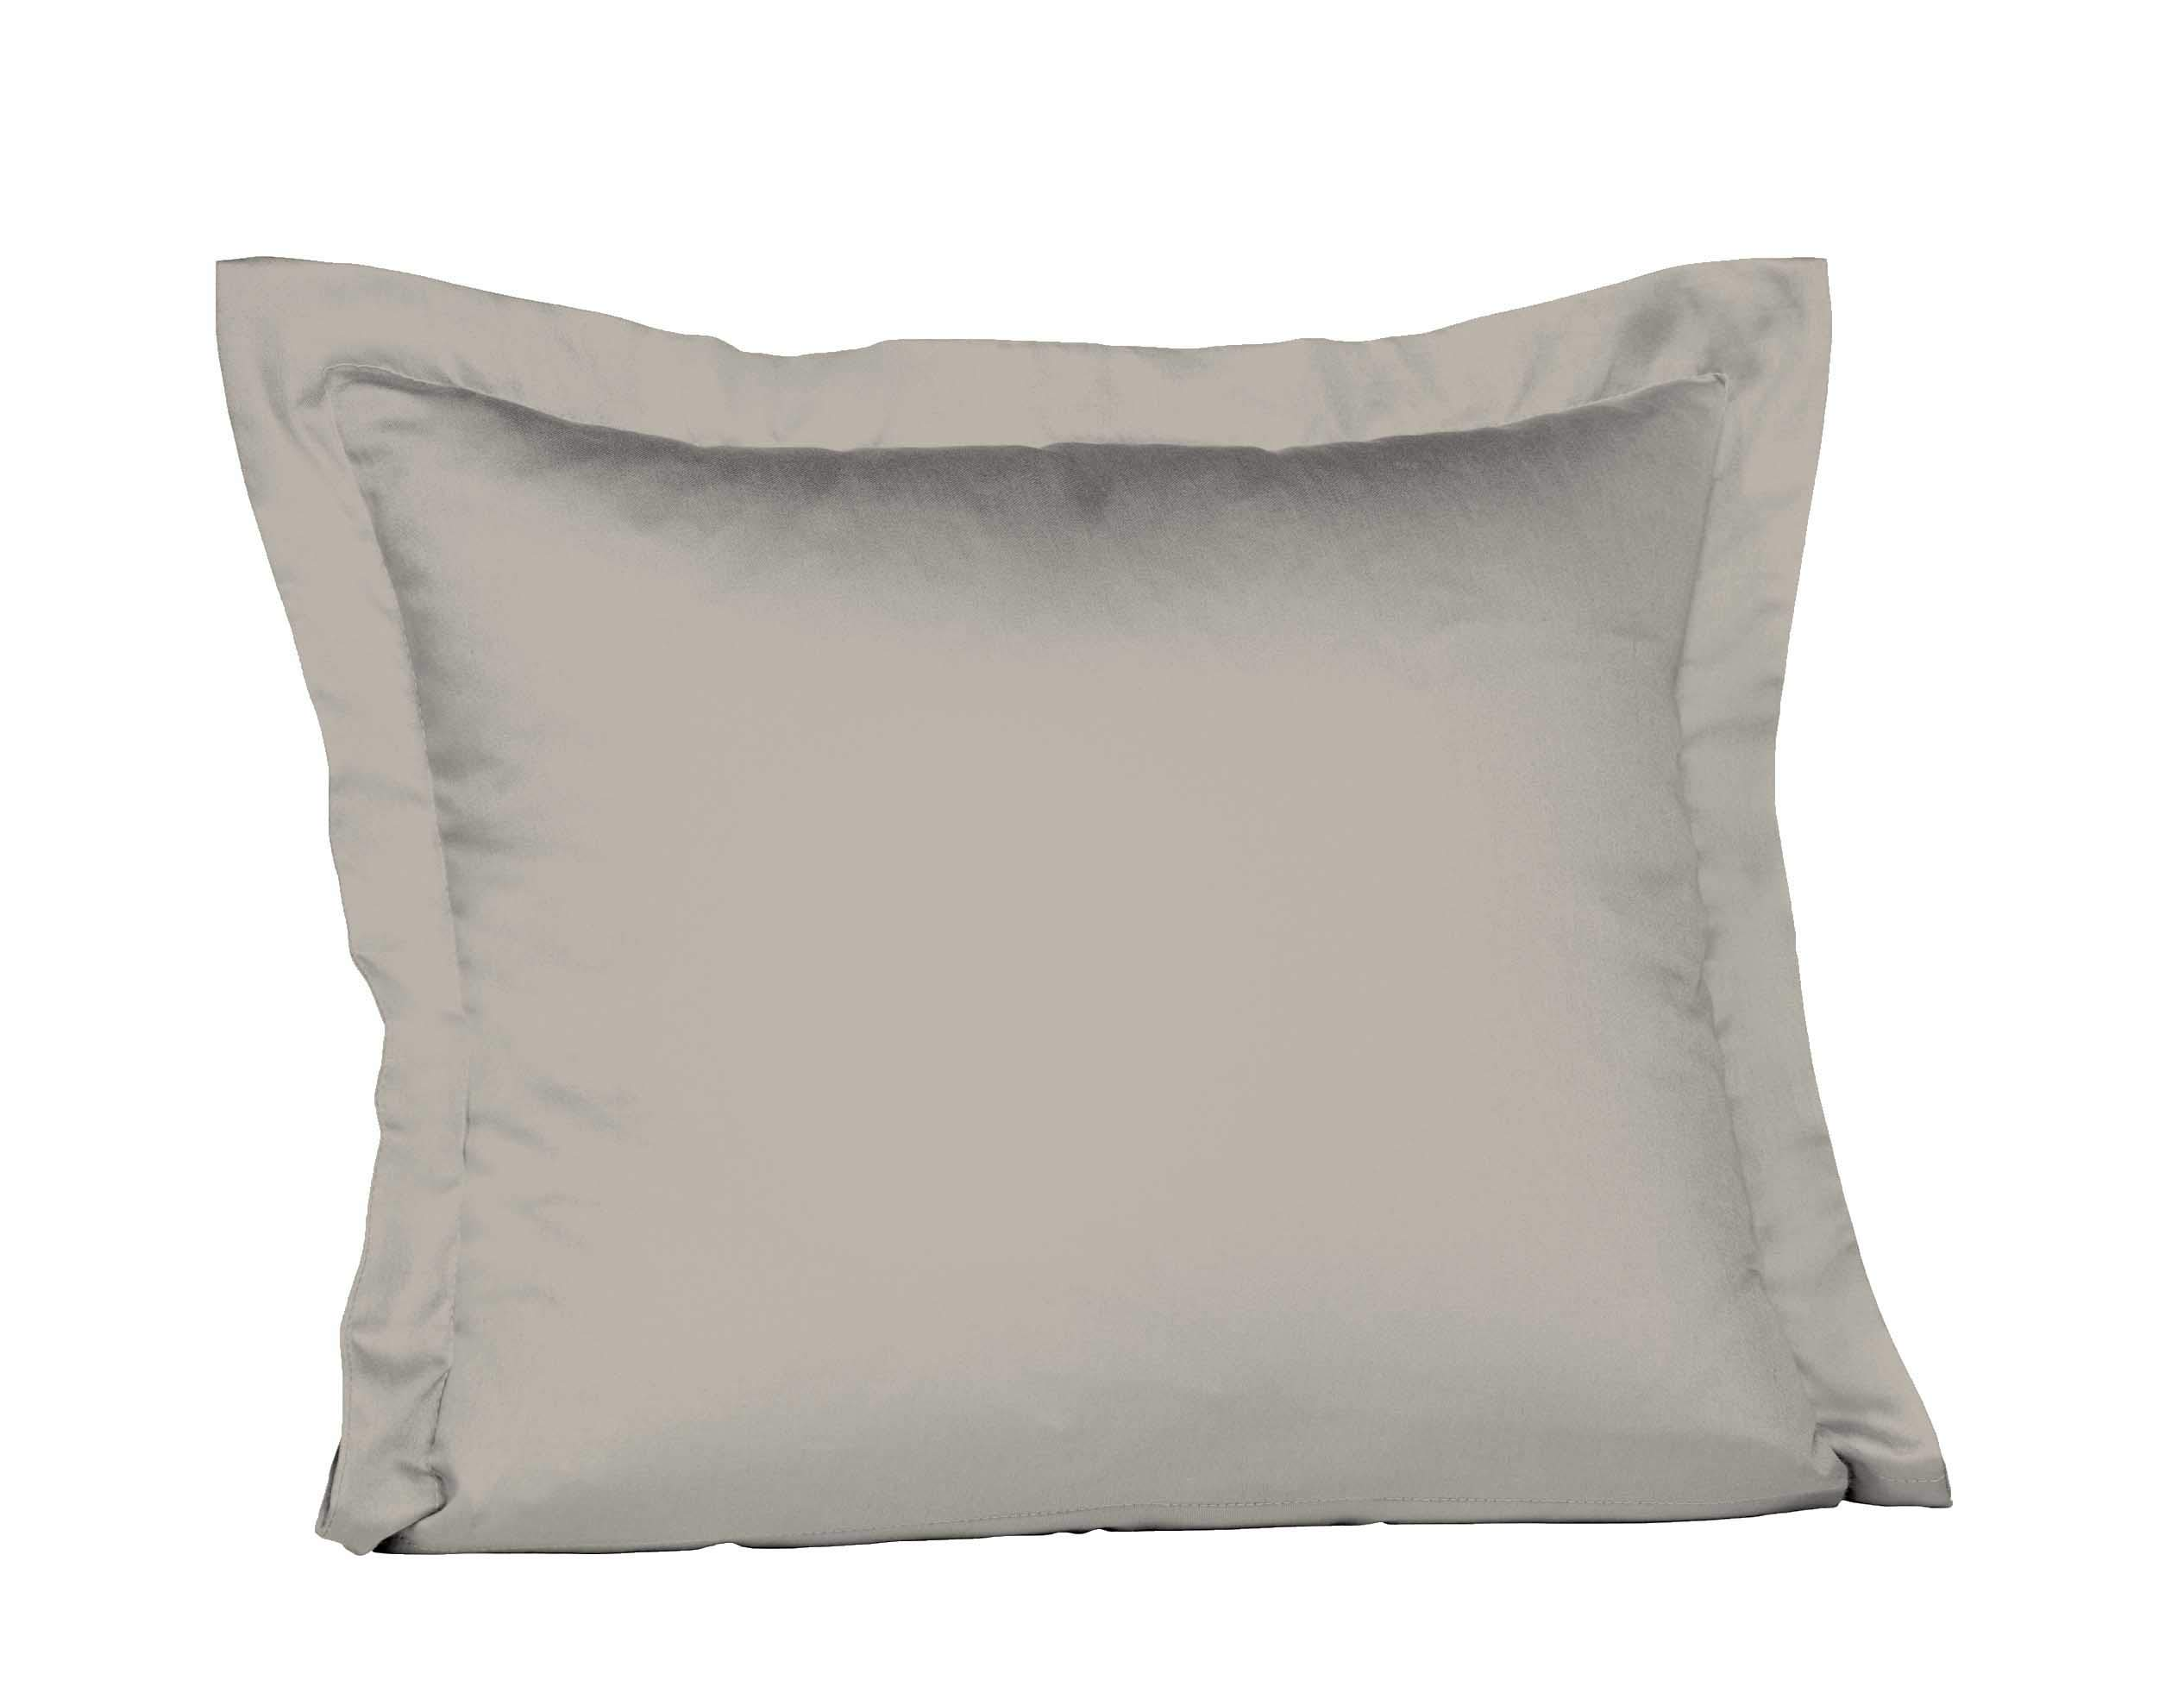 Fleuresse 4043202061161 - Funda de Almohada de algodón/satén 35 x 40cm: Amazon.es: Hogar